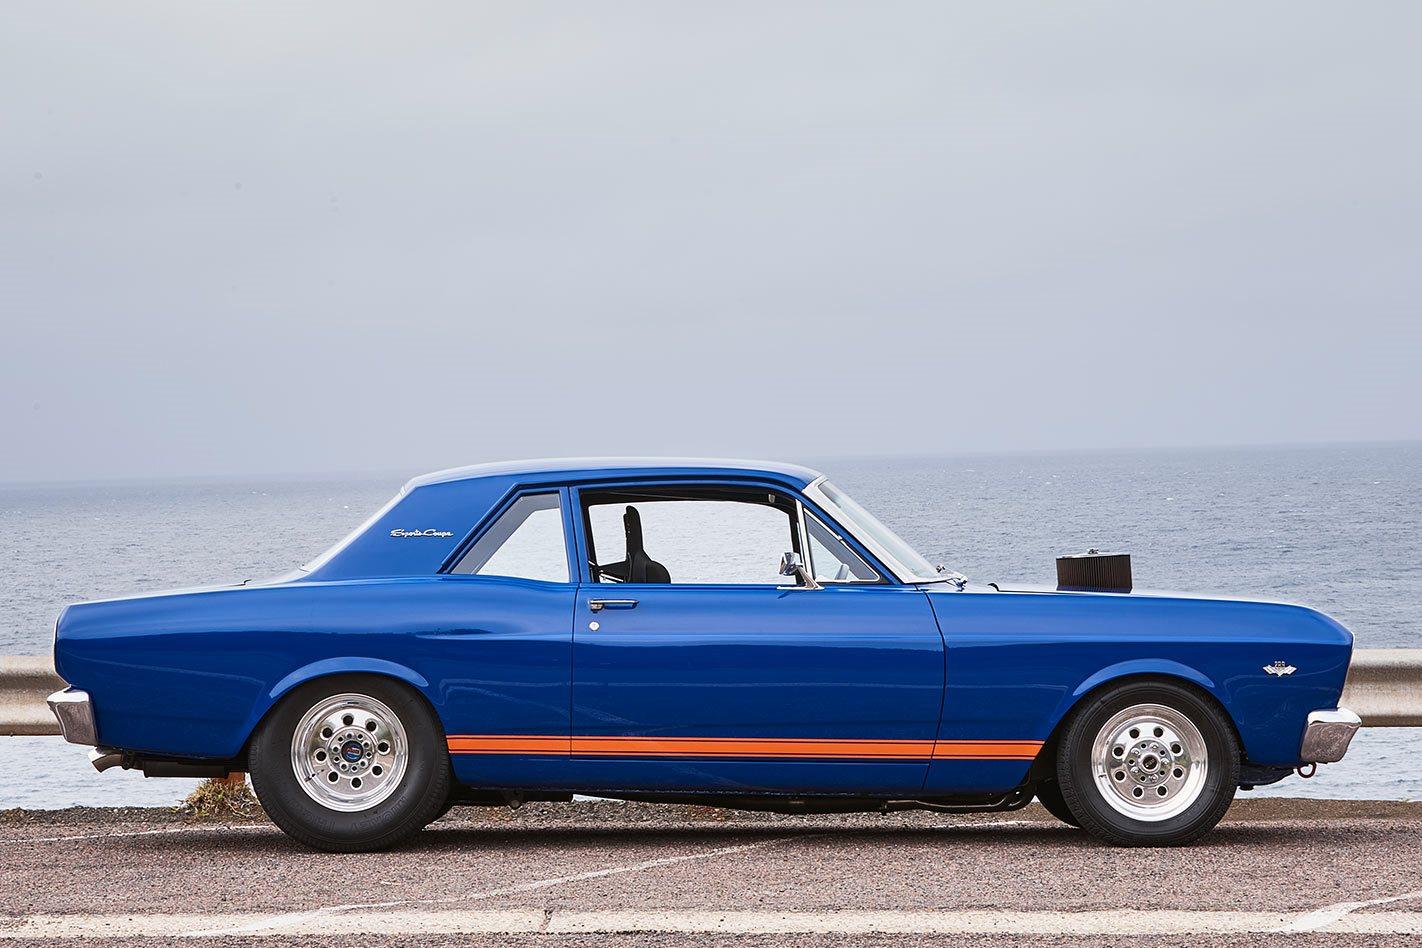 Ford futura sports coupe